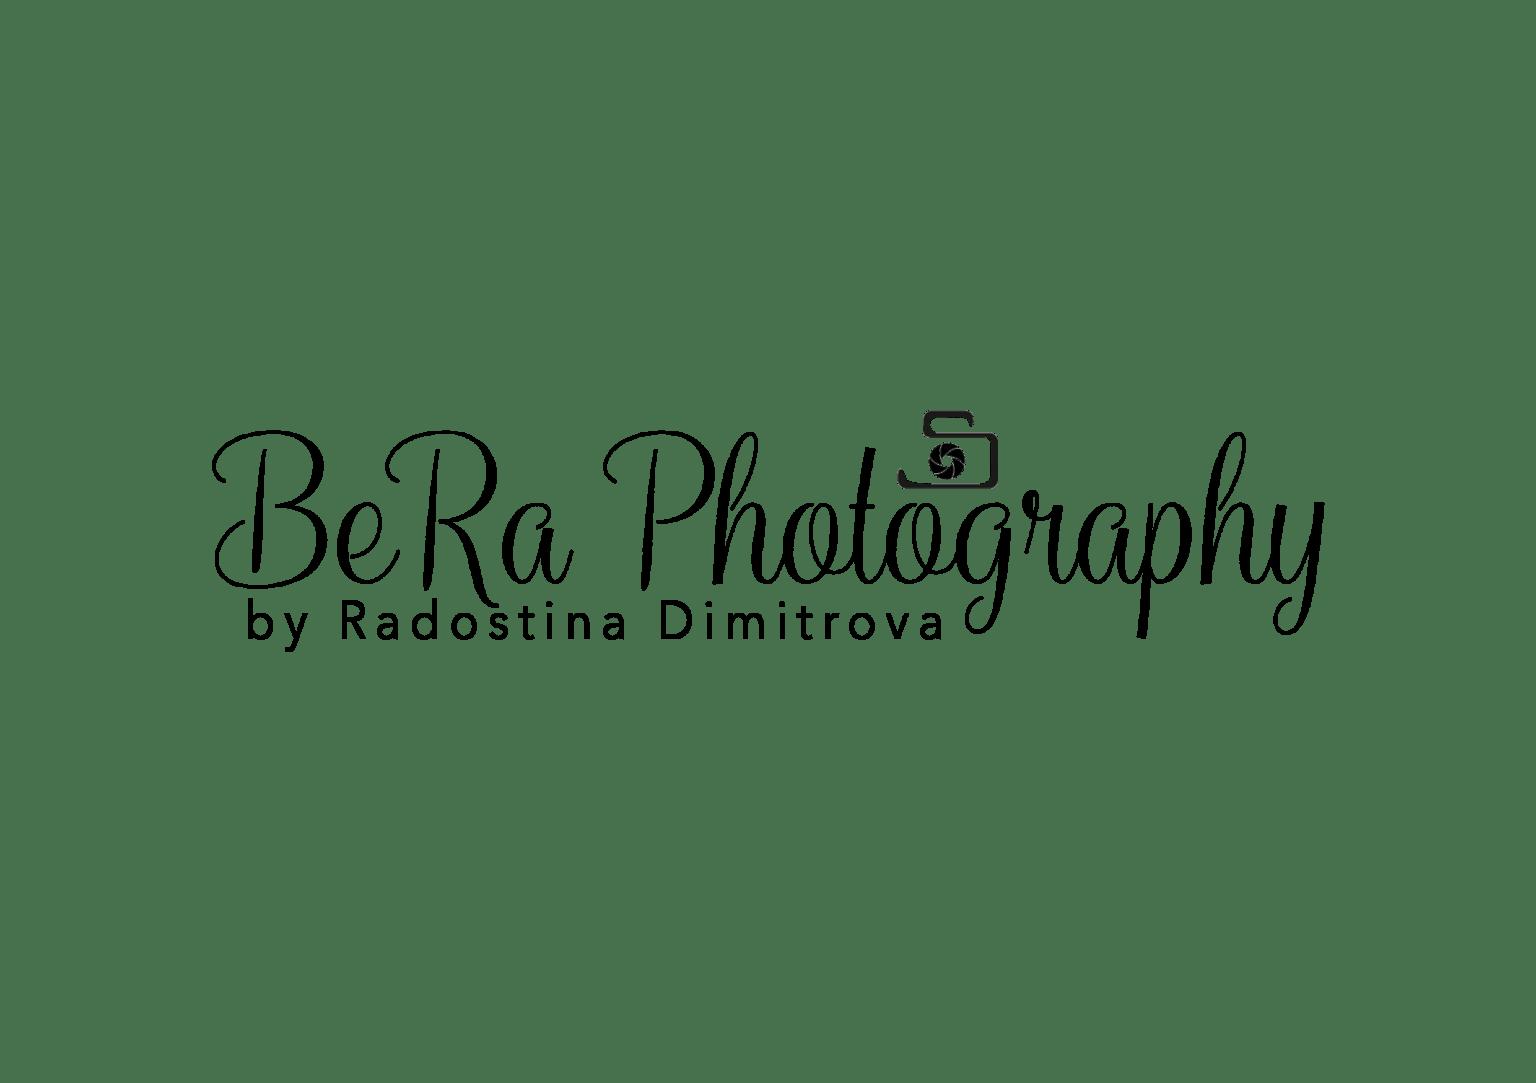 Bera-Photography-RADOSTINA-DIMITROVA-Fuerteventura